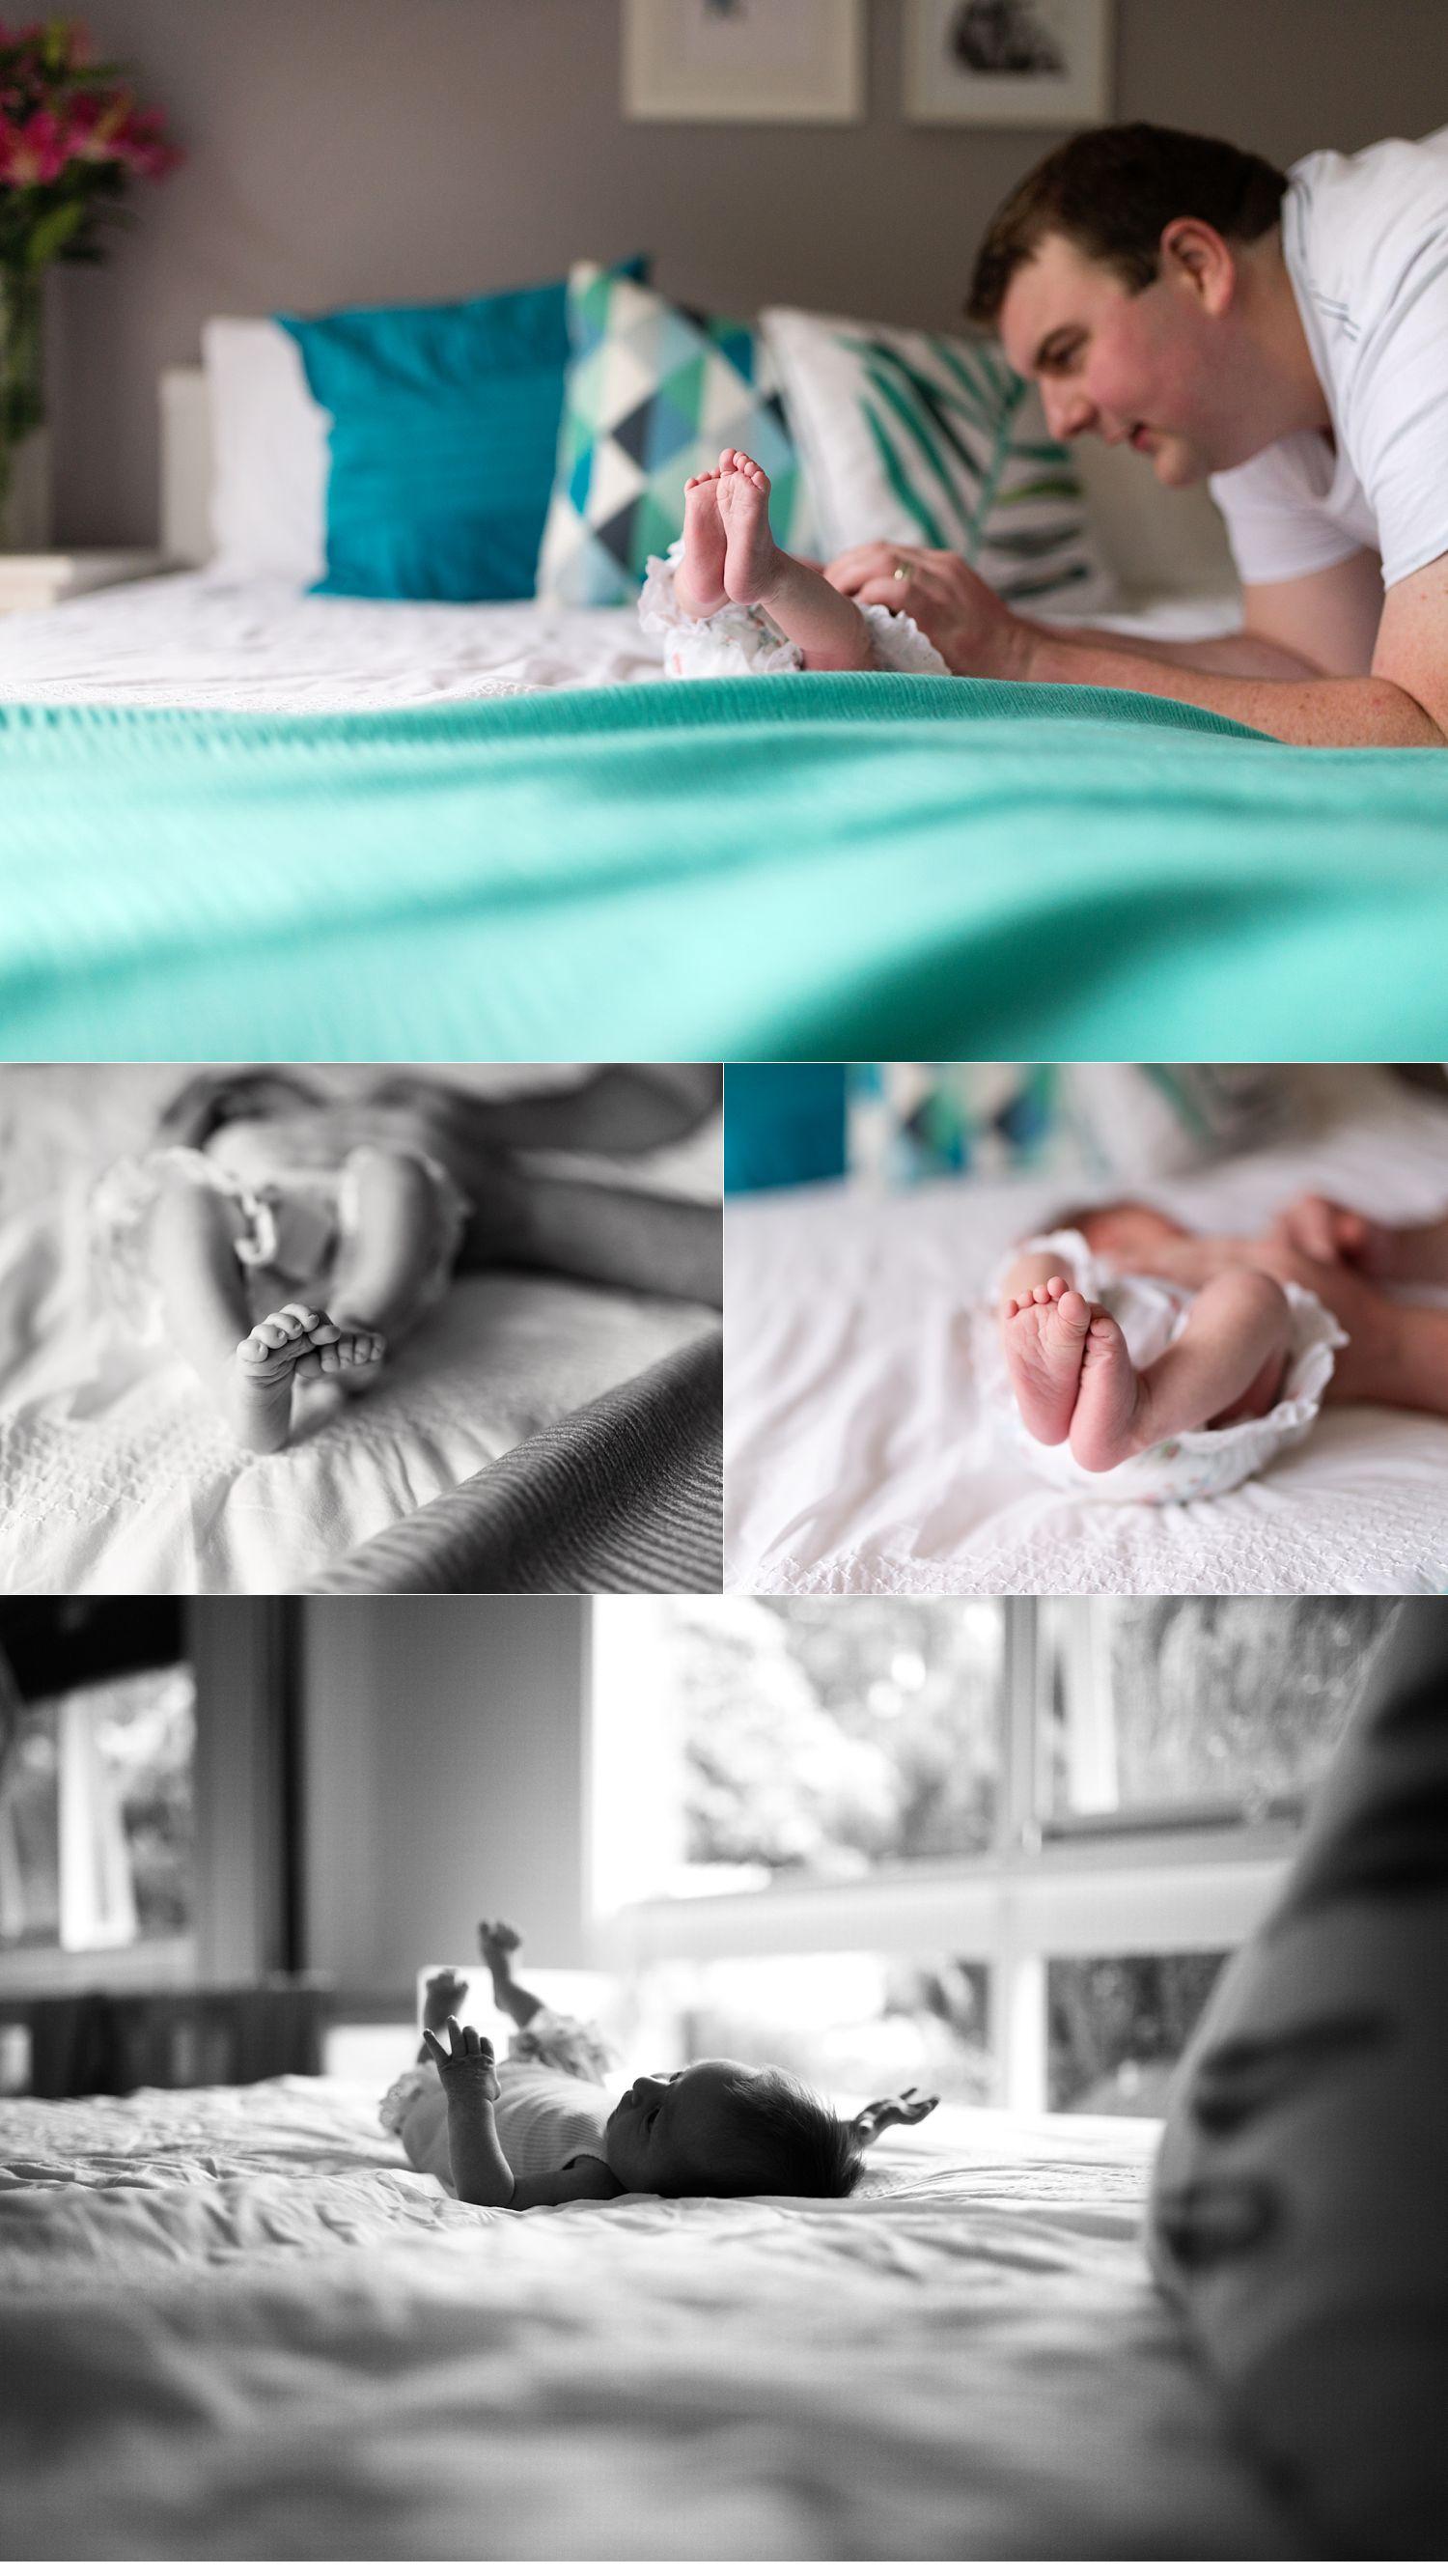 capturing-precious-moments-newborn-photography-melbourne.jpg